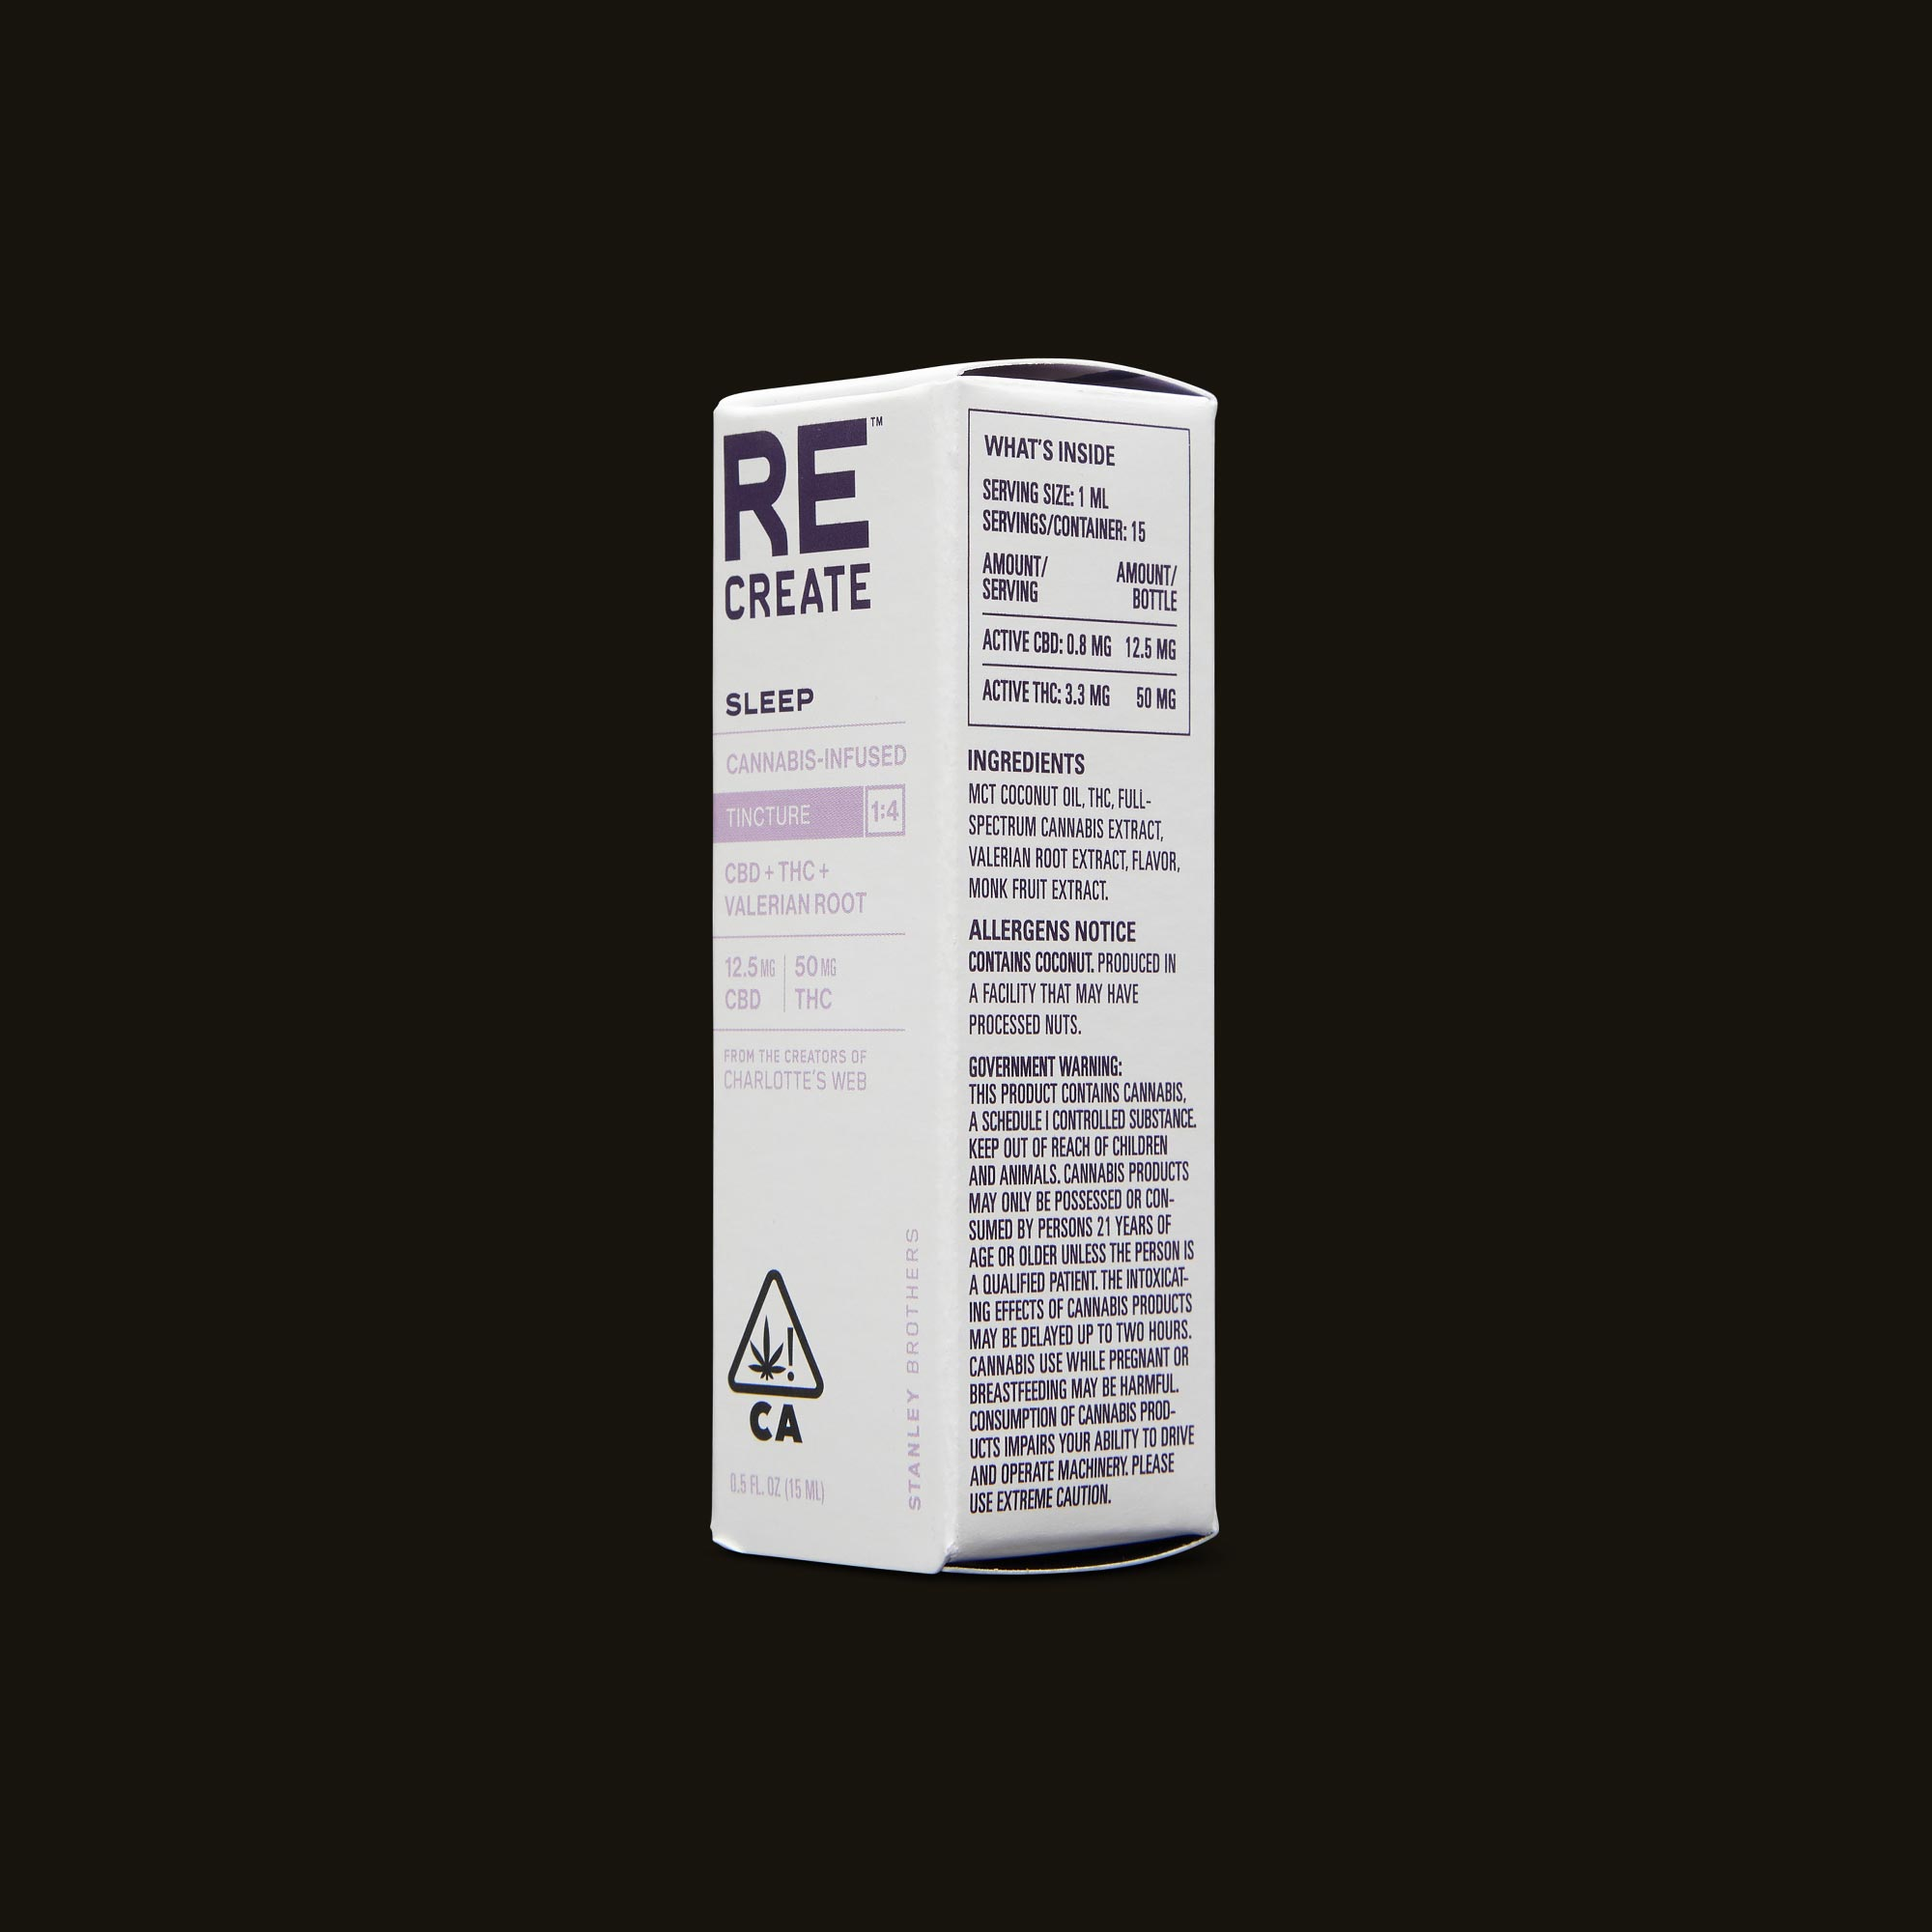 ReCreate Sleep Tincture - 15ml Ingredients